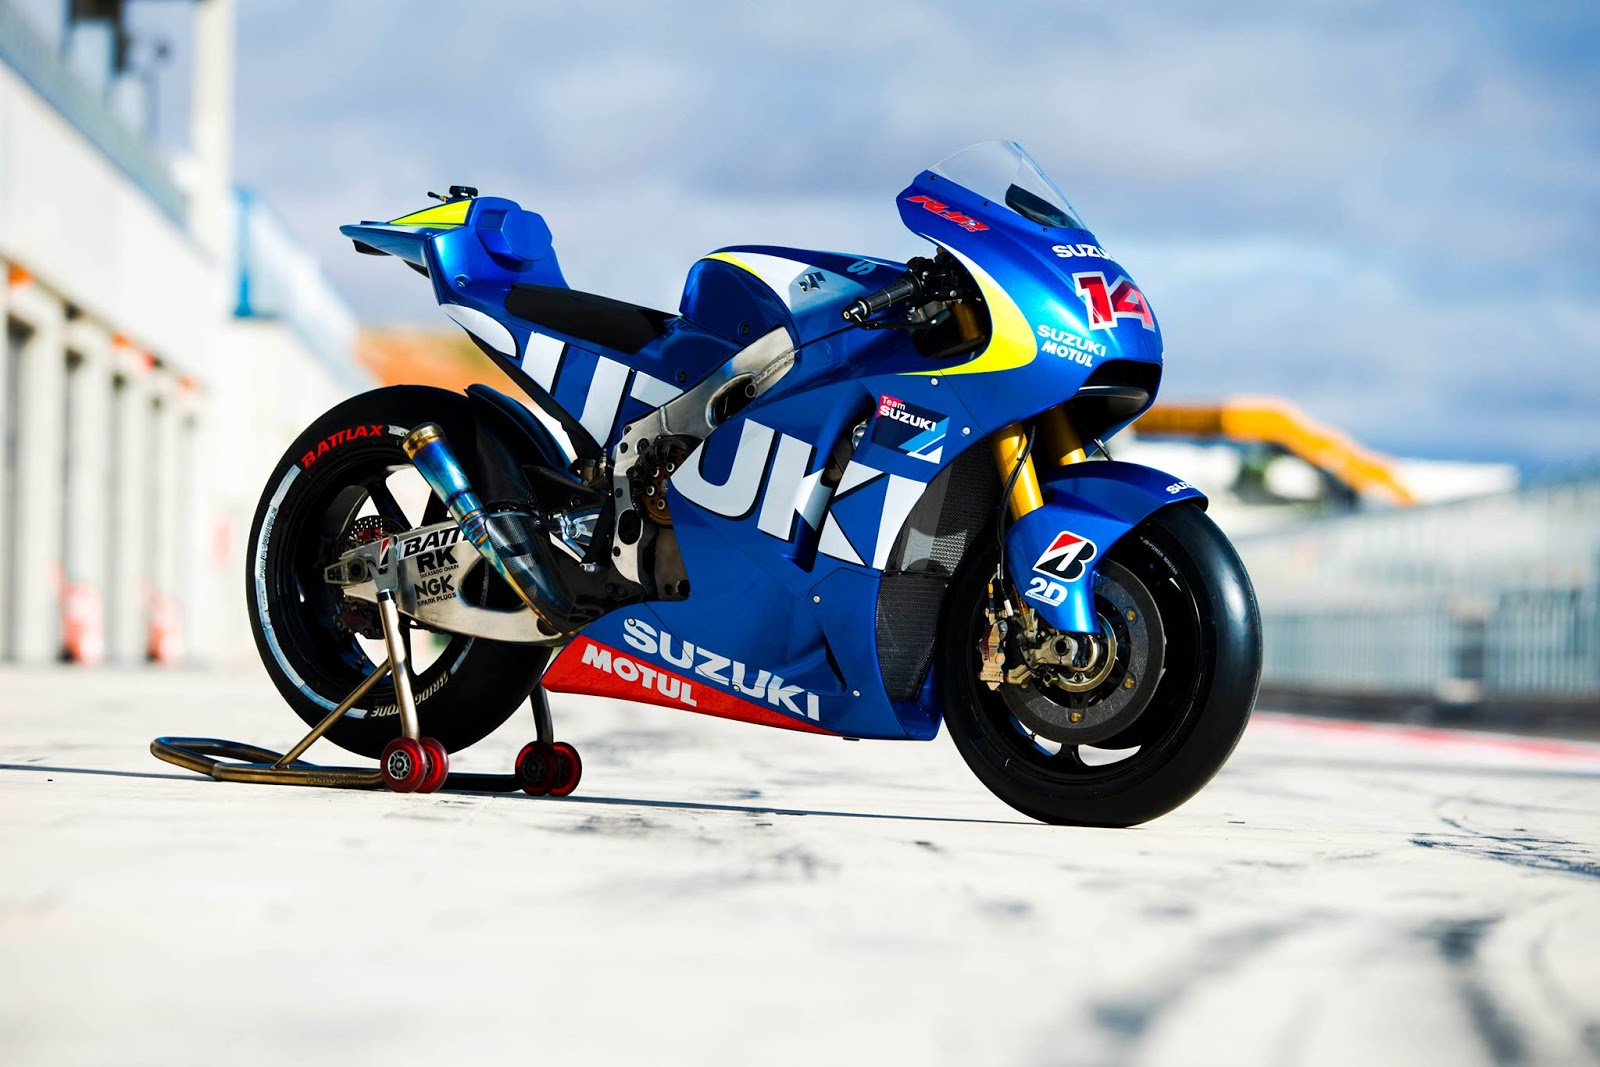 MotoGP - Saison 2013 - - Page 39 Suzuki+MOTOGP+2013+06